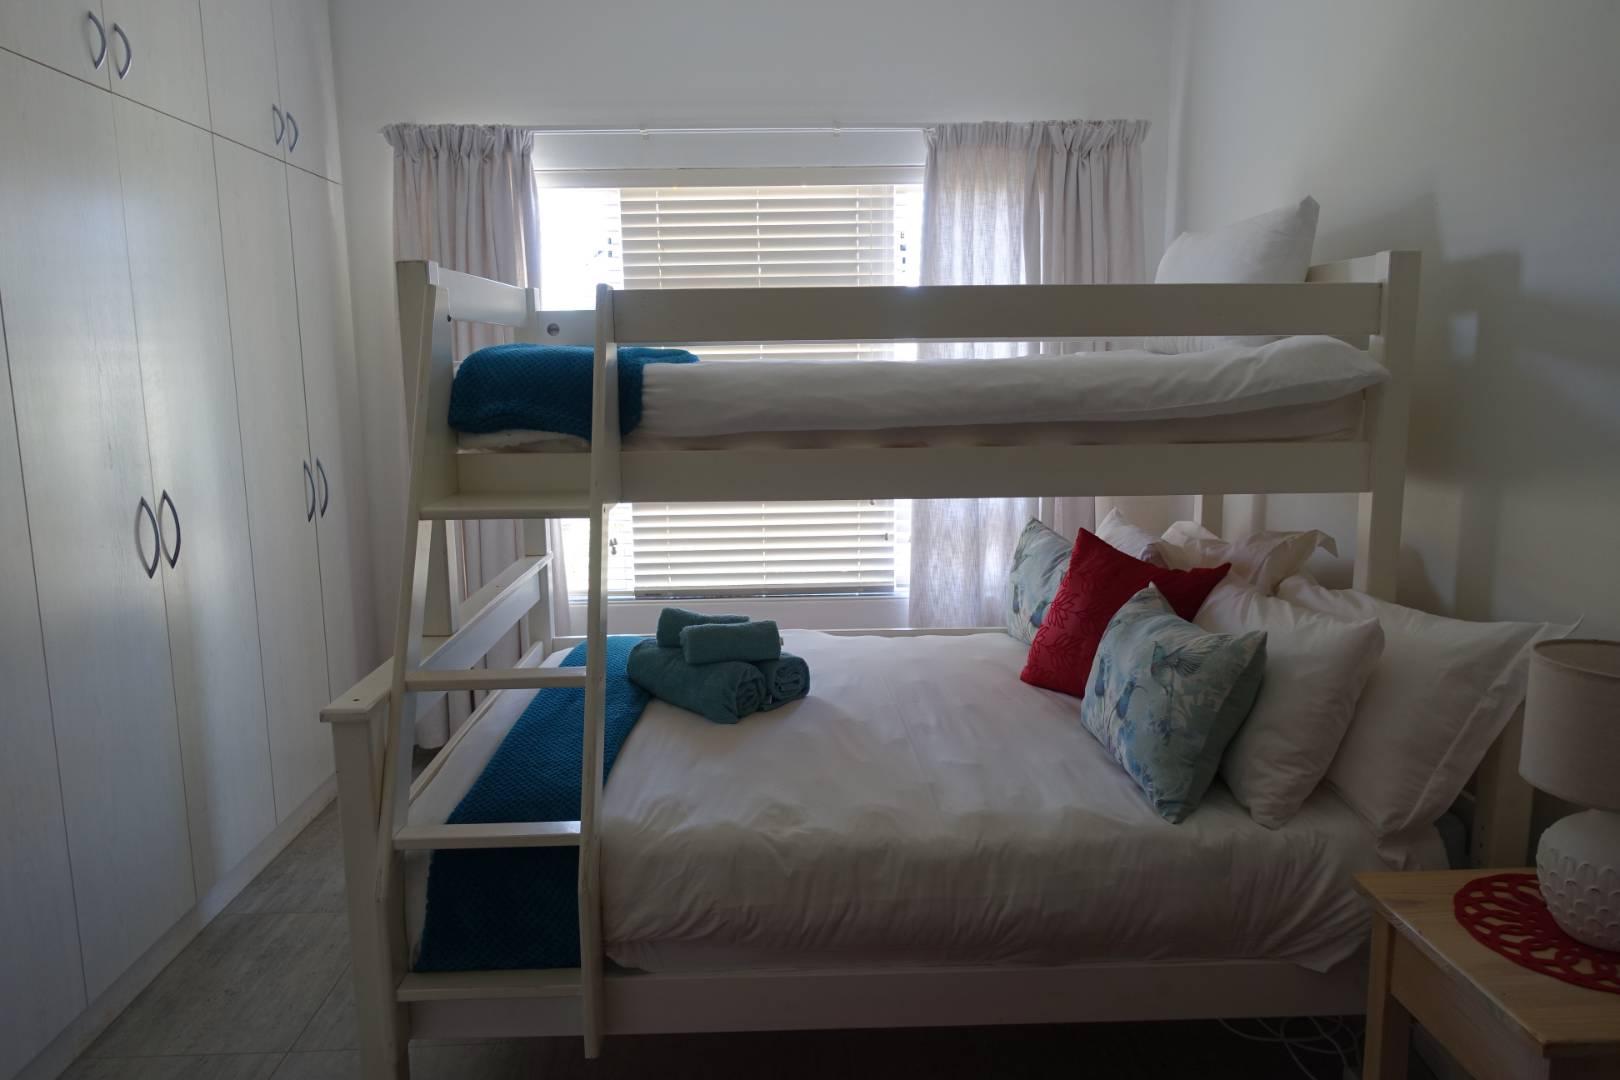 Second bedrooms